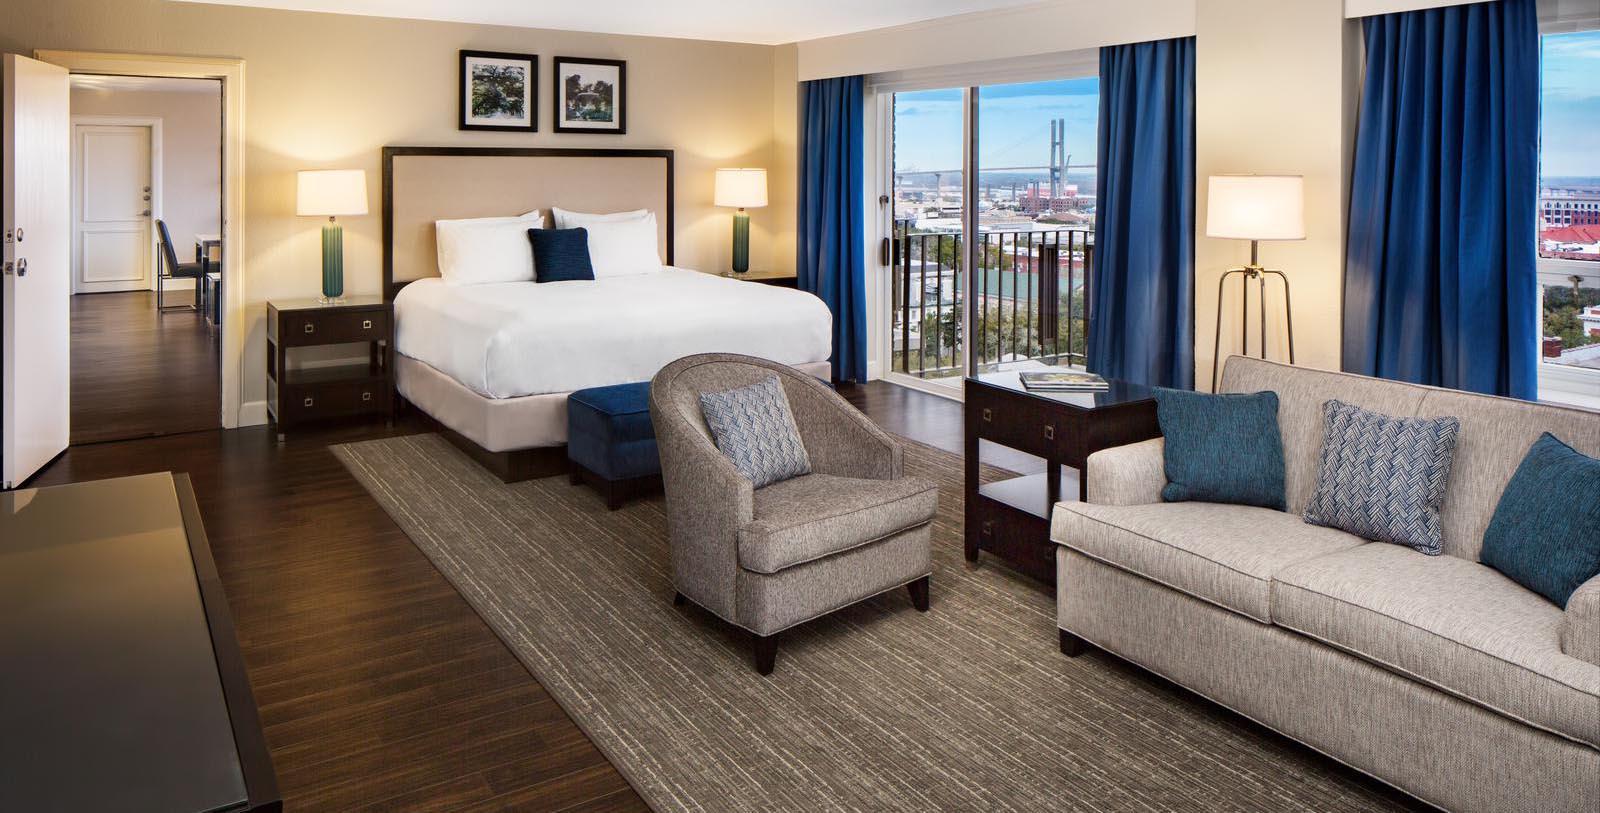 Image of Guestroom The DeSoto, 1890, Member of Historic Hotels of America, in Savannah, Georgia, Location